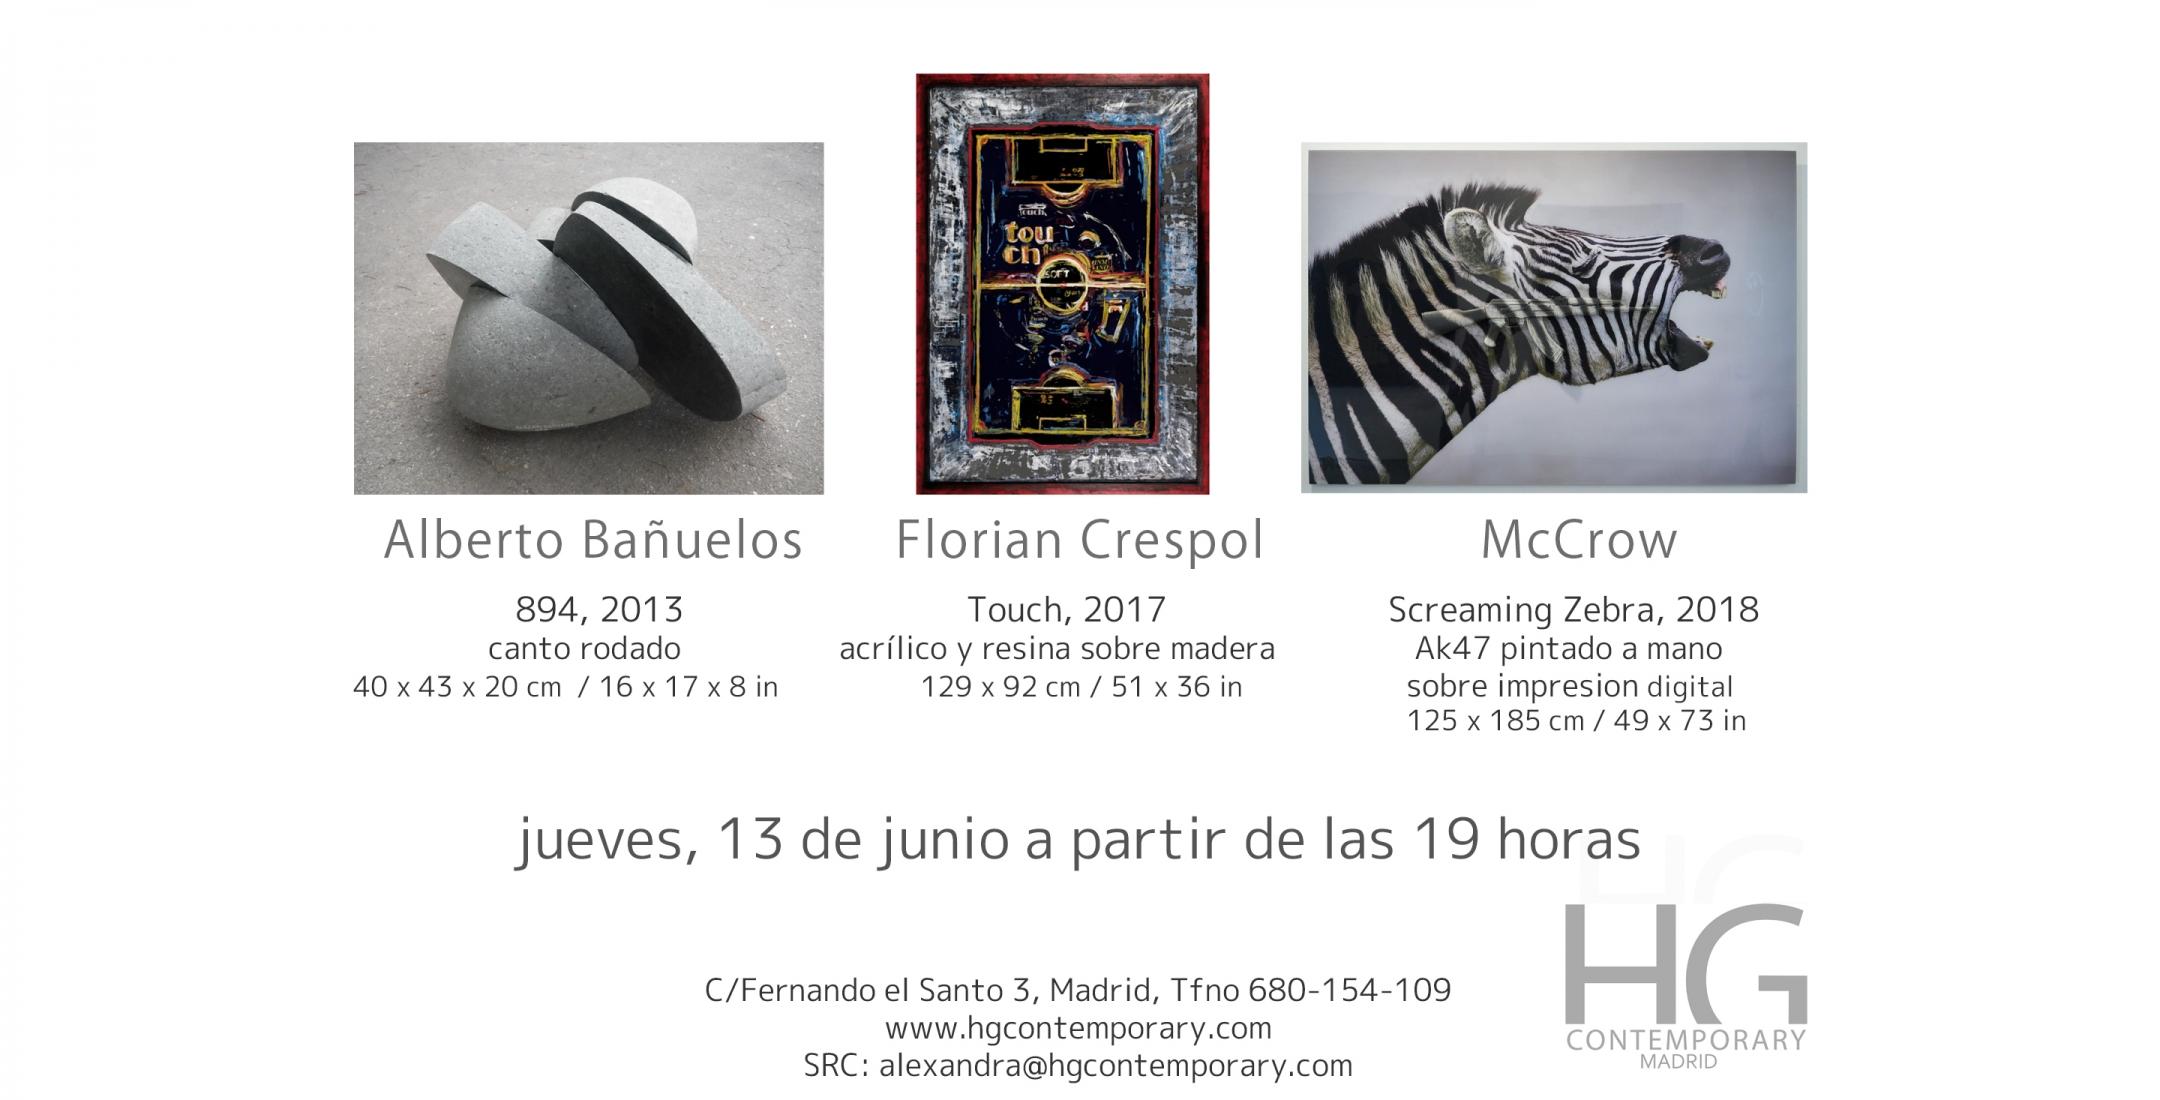 HG CONTEMPORARY MADRID